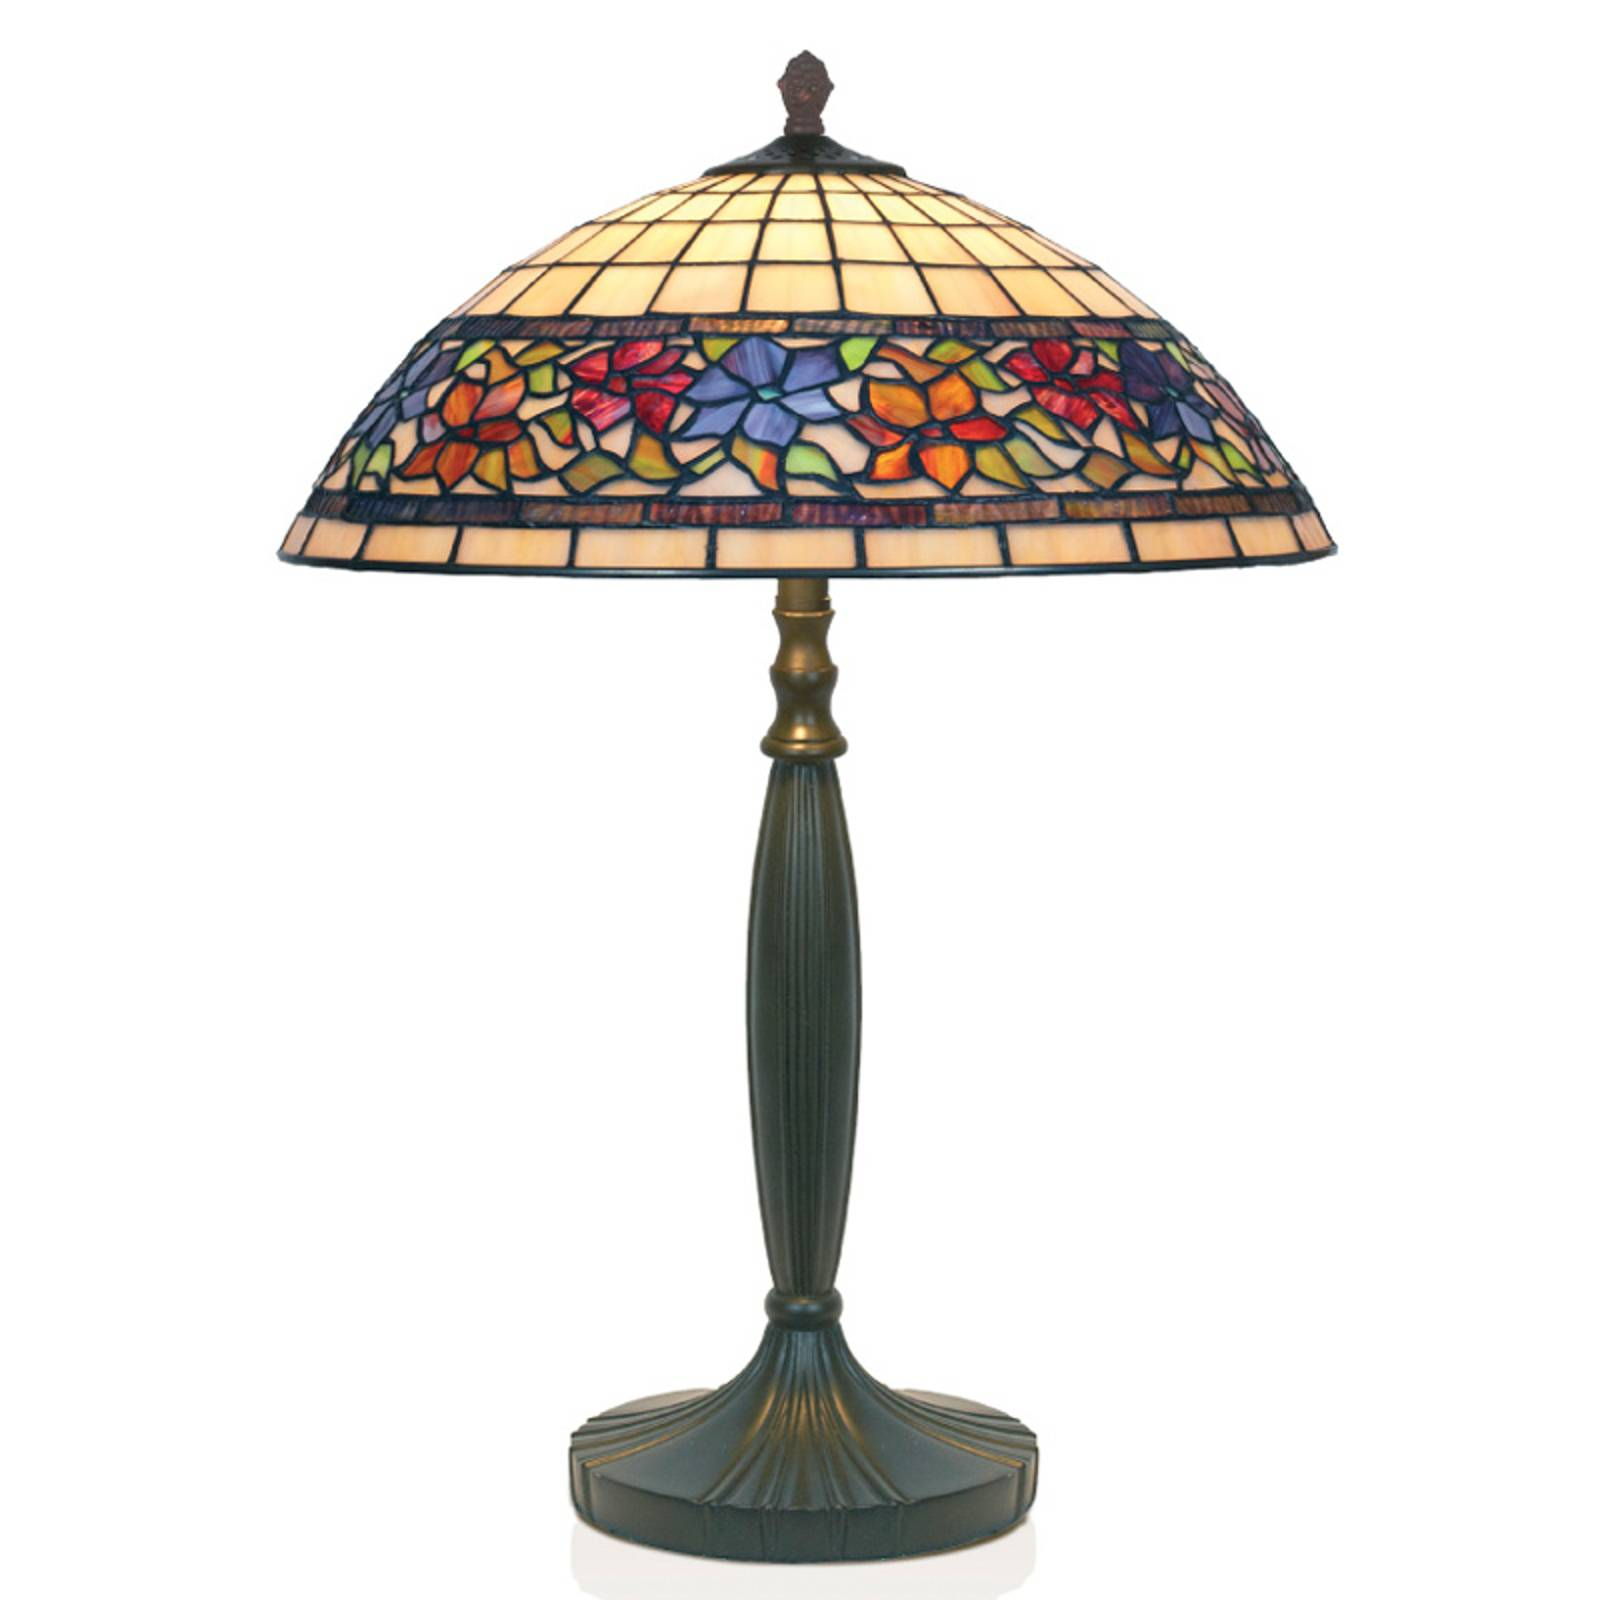 Handgemaakte tafellamp FLORA in Tiffany stijl